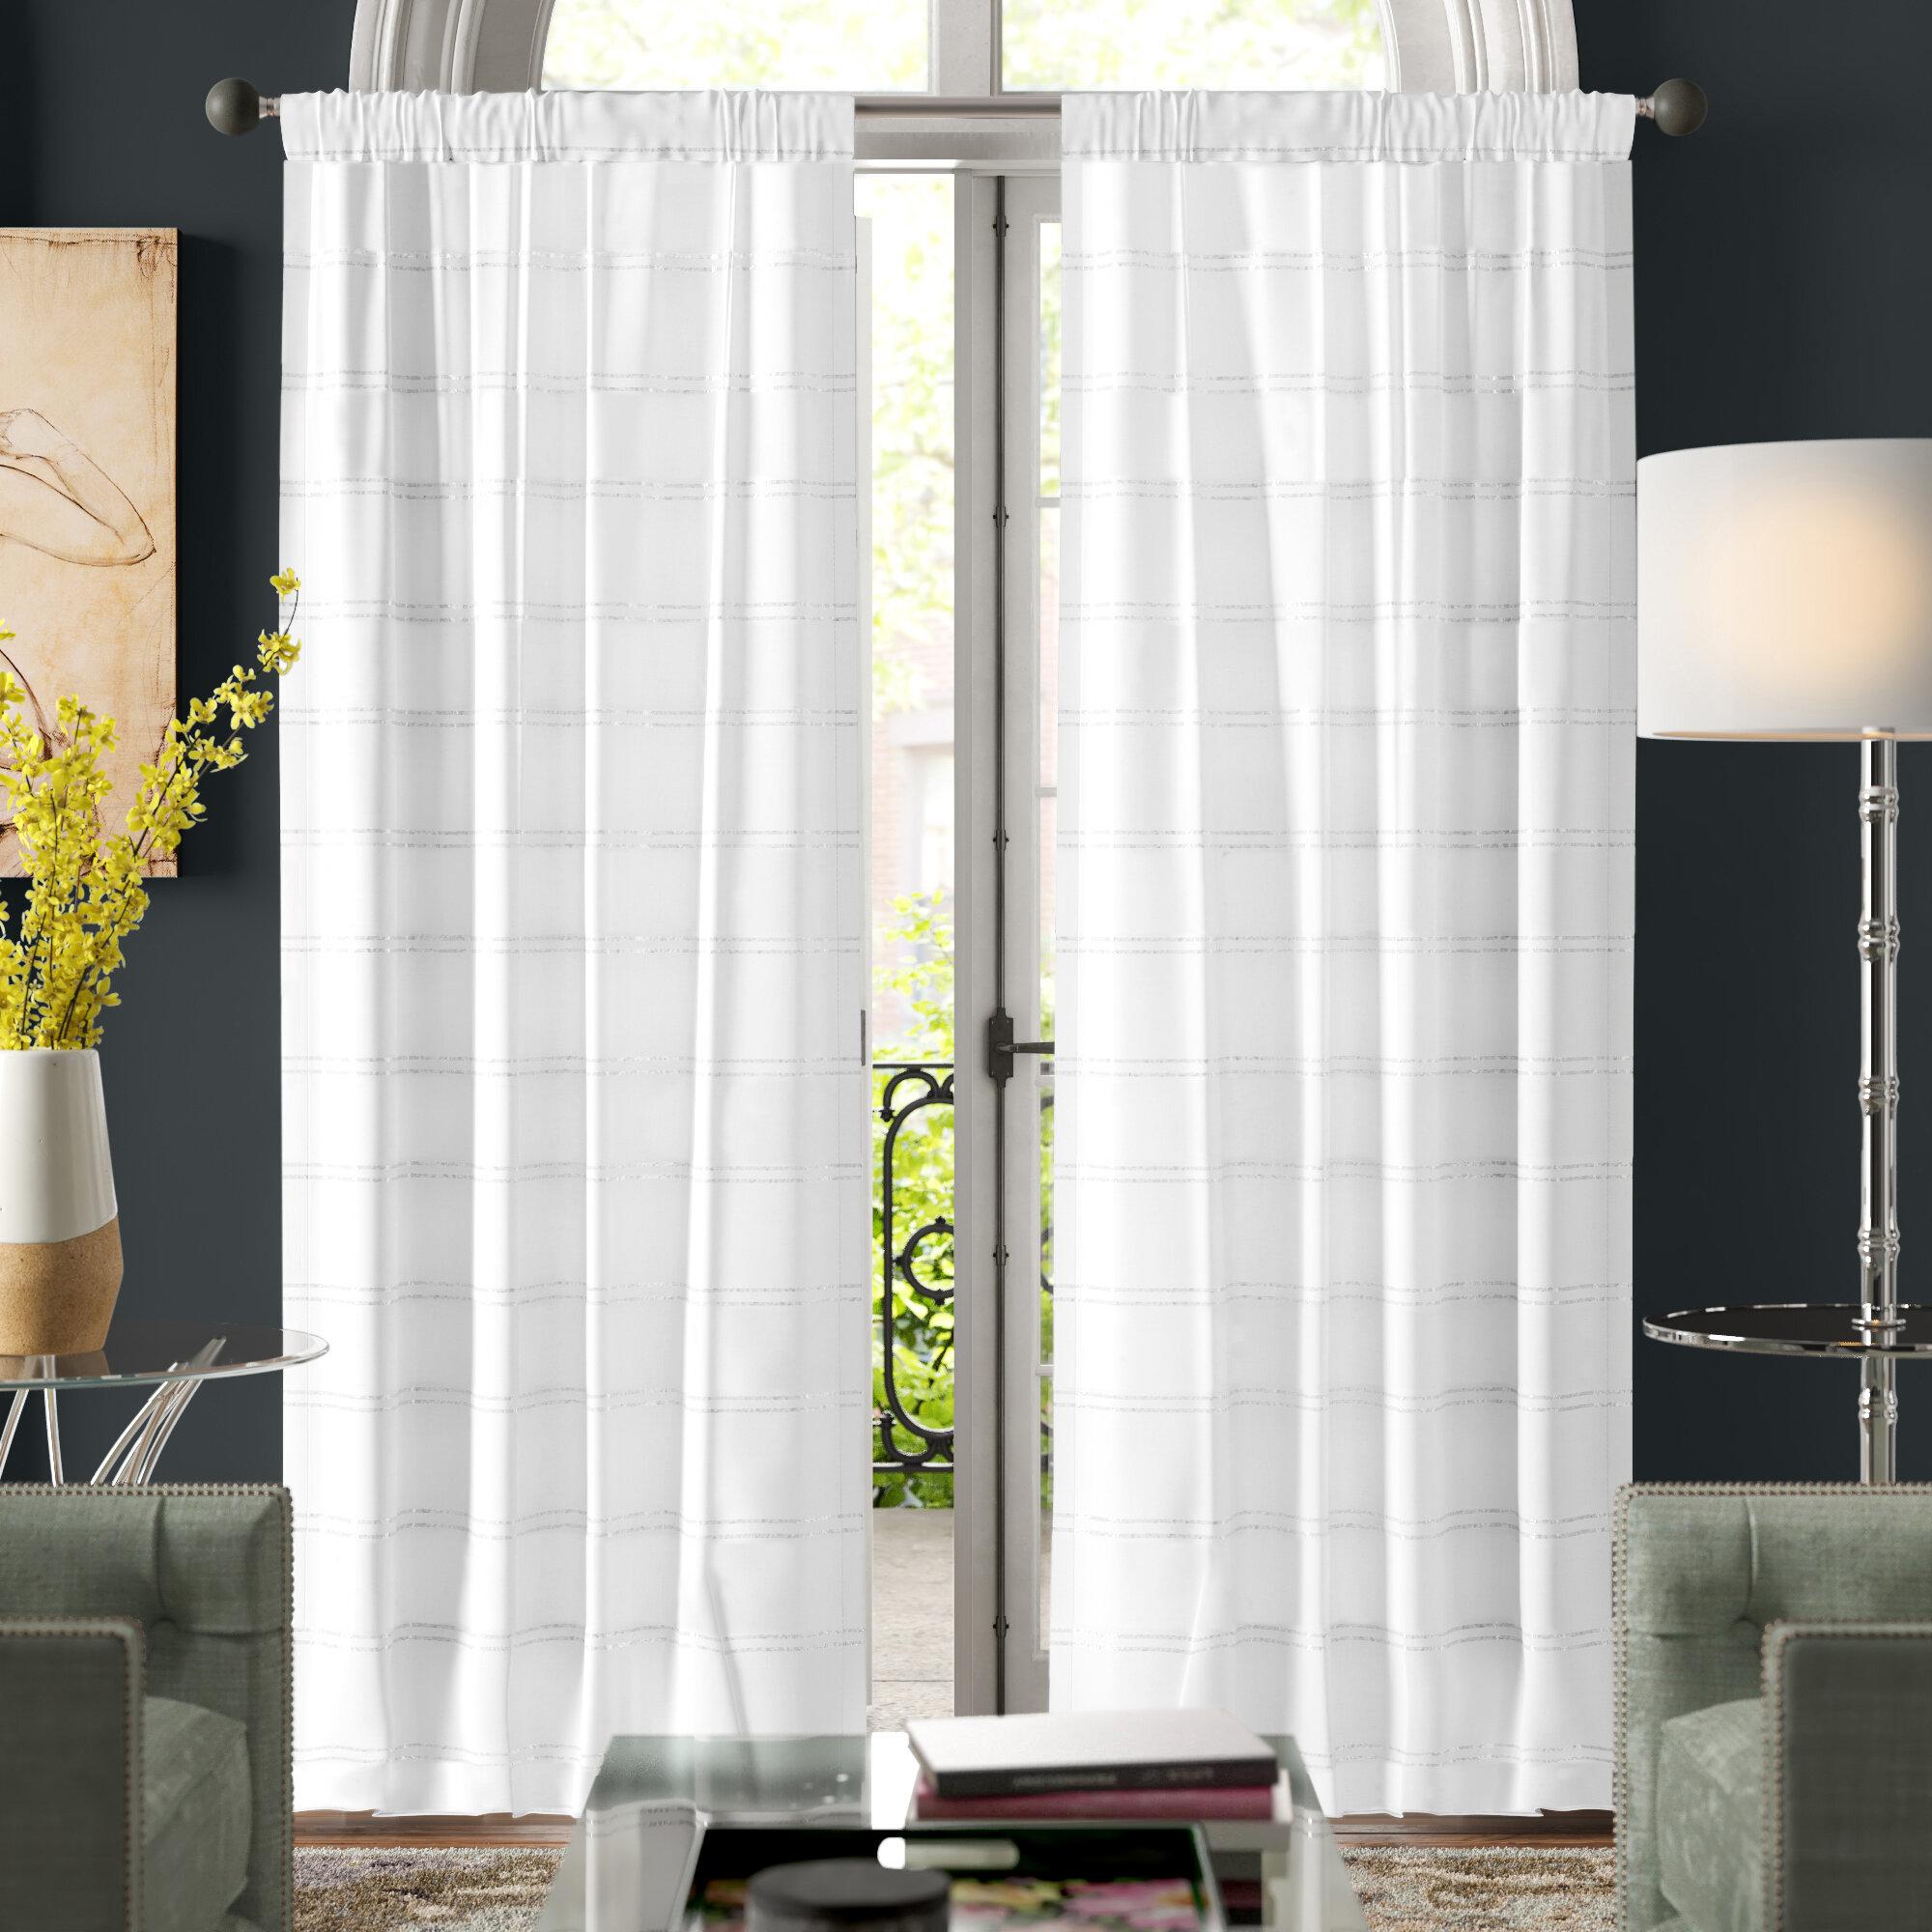 Stiles Pole Top Striped Room Darkening Thermal Rod Pocket Curtain Panels Reviews Joss Main